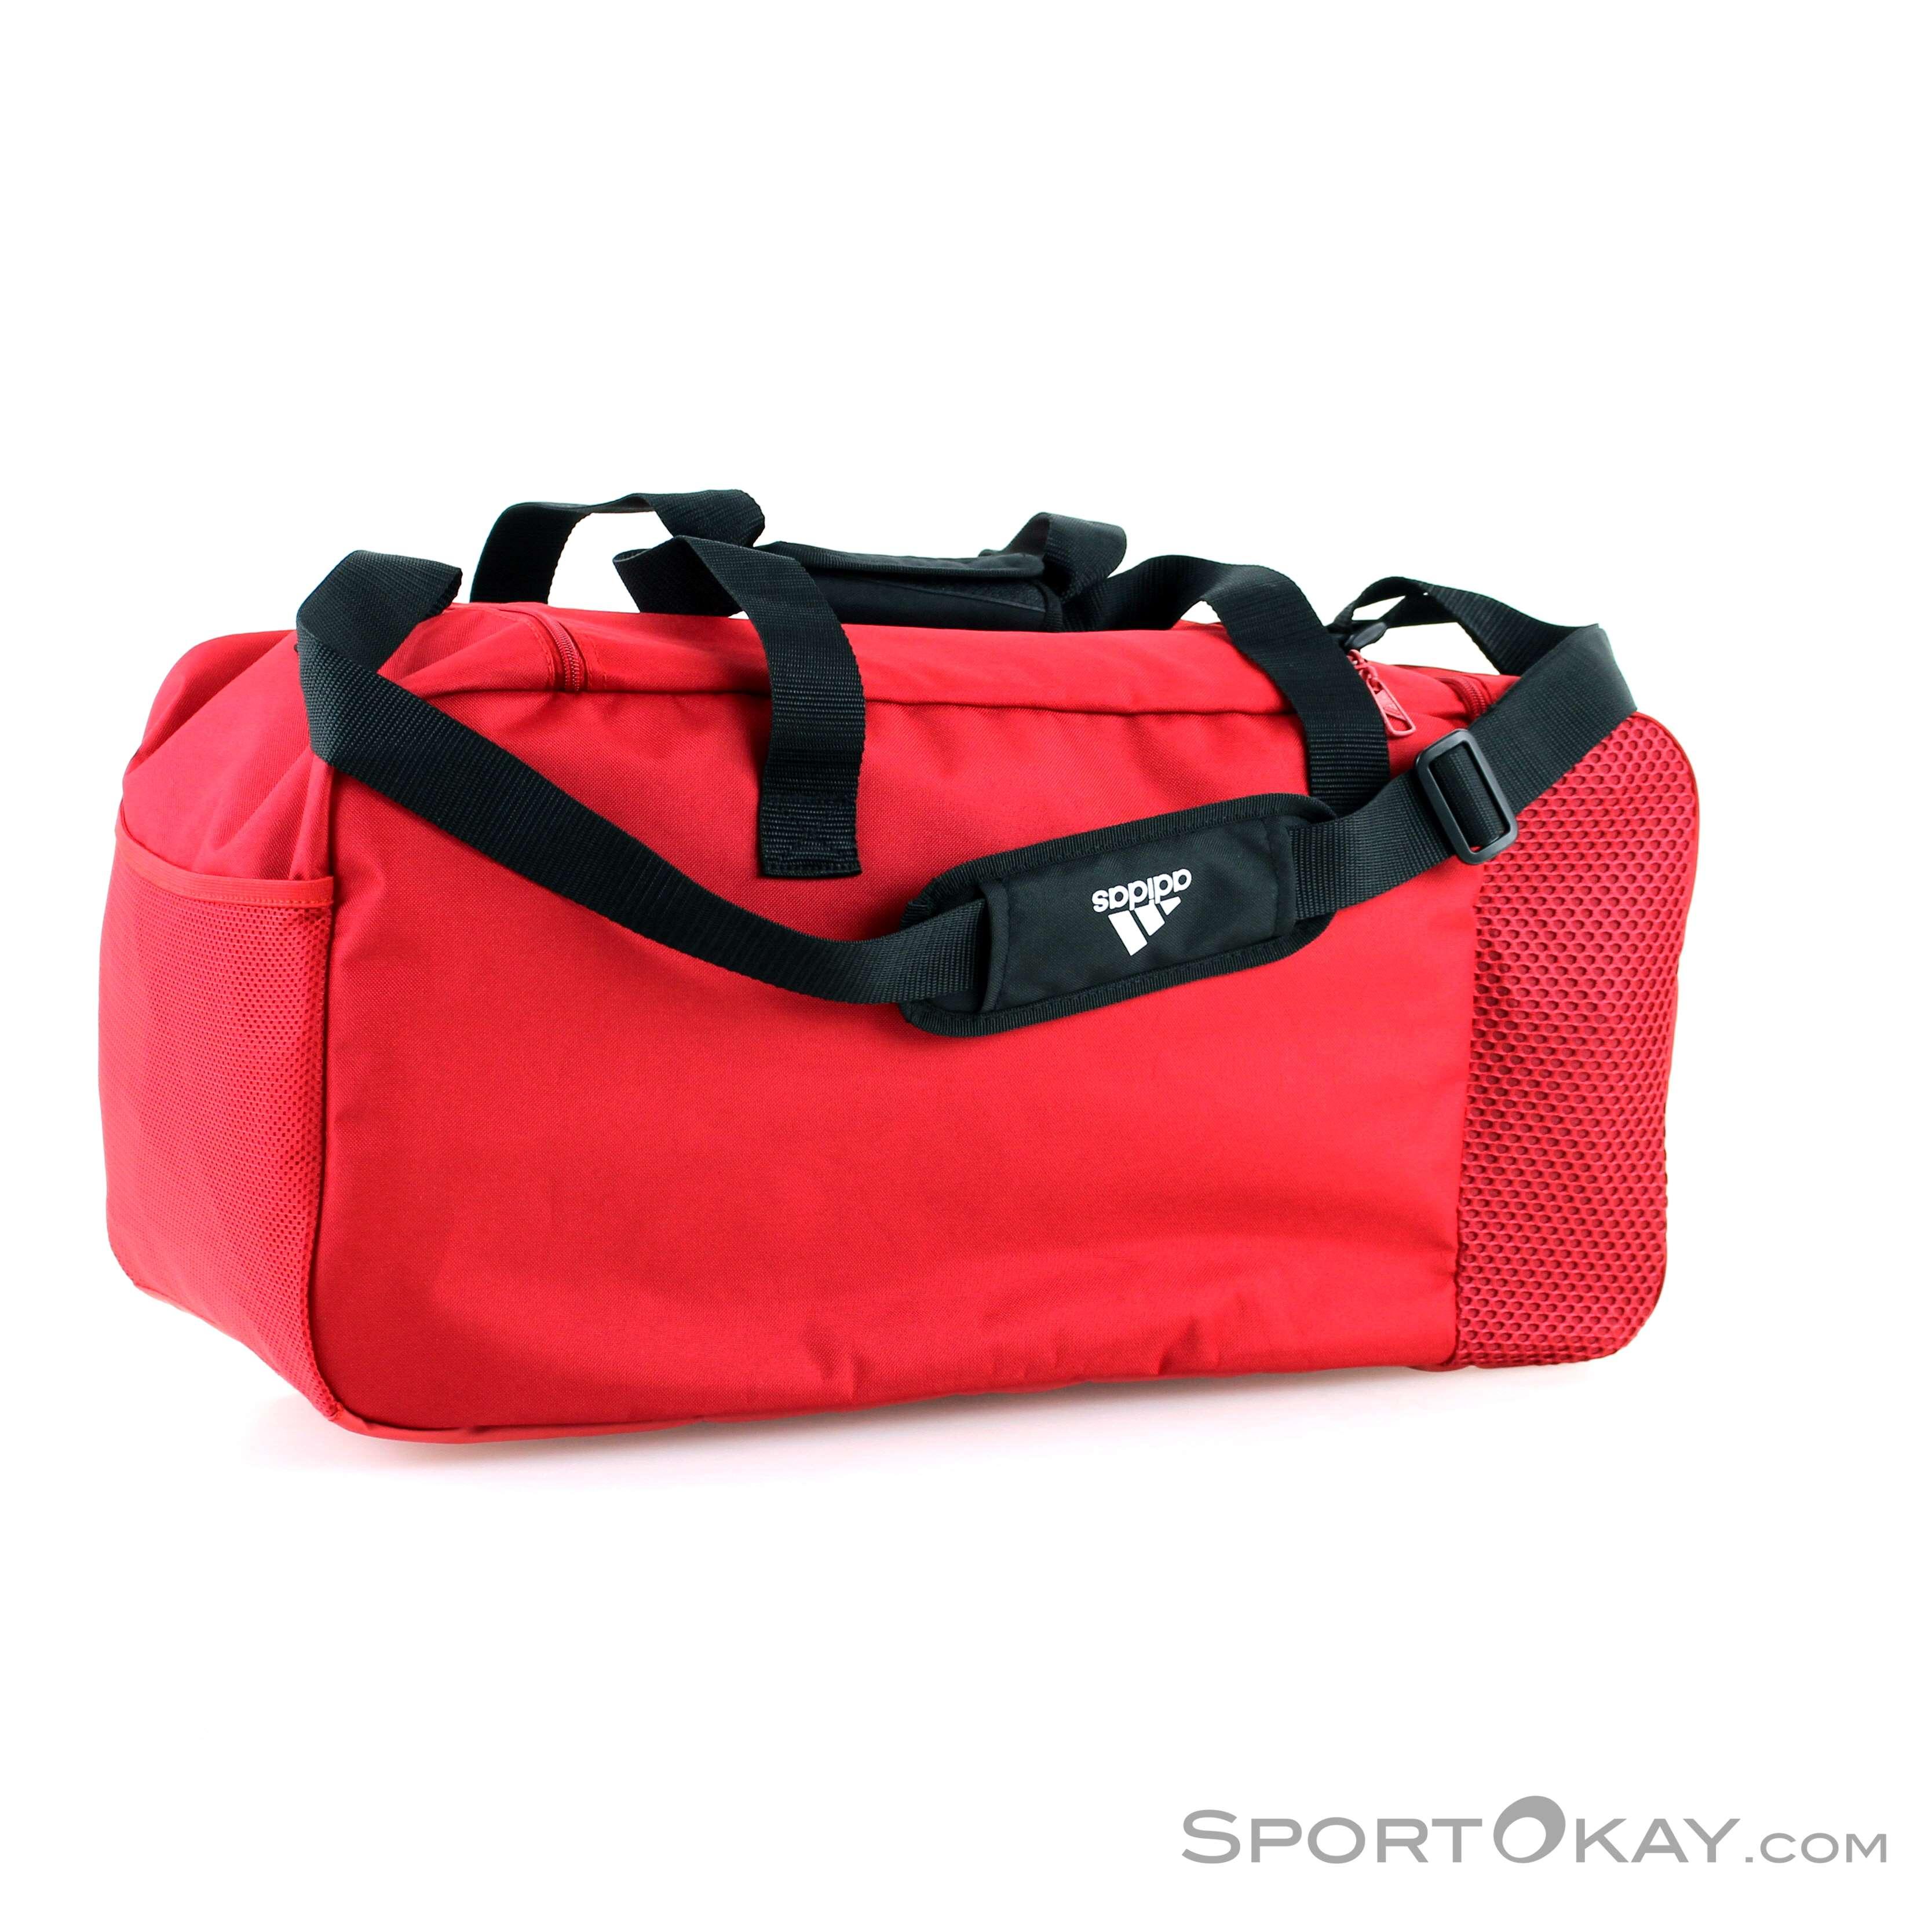 c87849d0faec adidas Tiro Duffel M Sporttasche, adidas, Rot, , , 0002-11372,